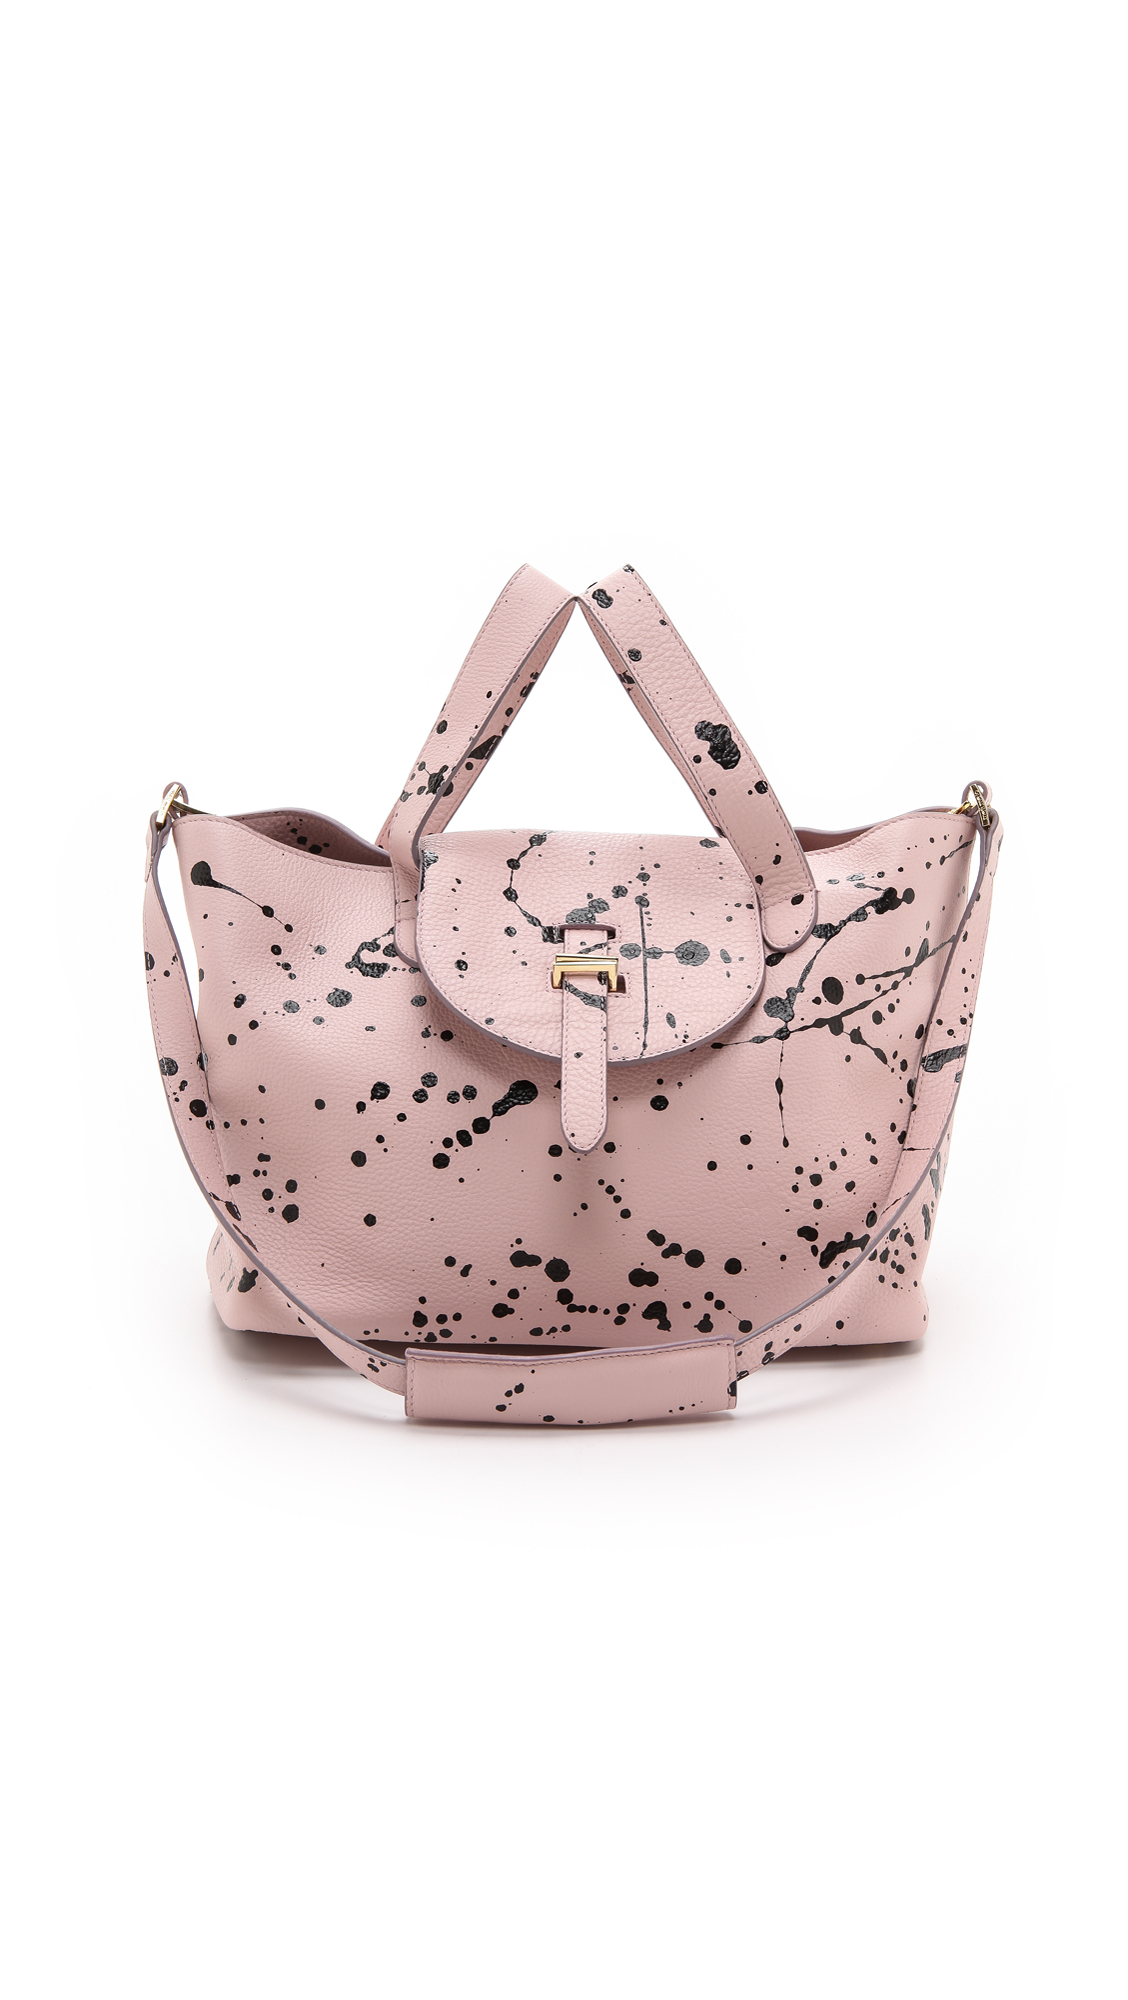 lyst meli melo paint splatter thela medium bag dusty pink splatter in pink. Black Bedroom Furniture Sets. Home Design Ideas